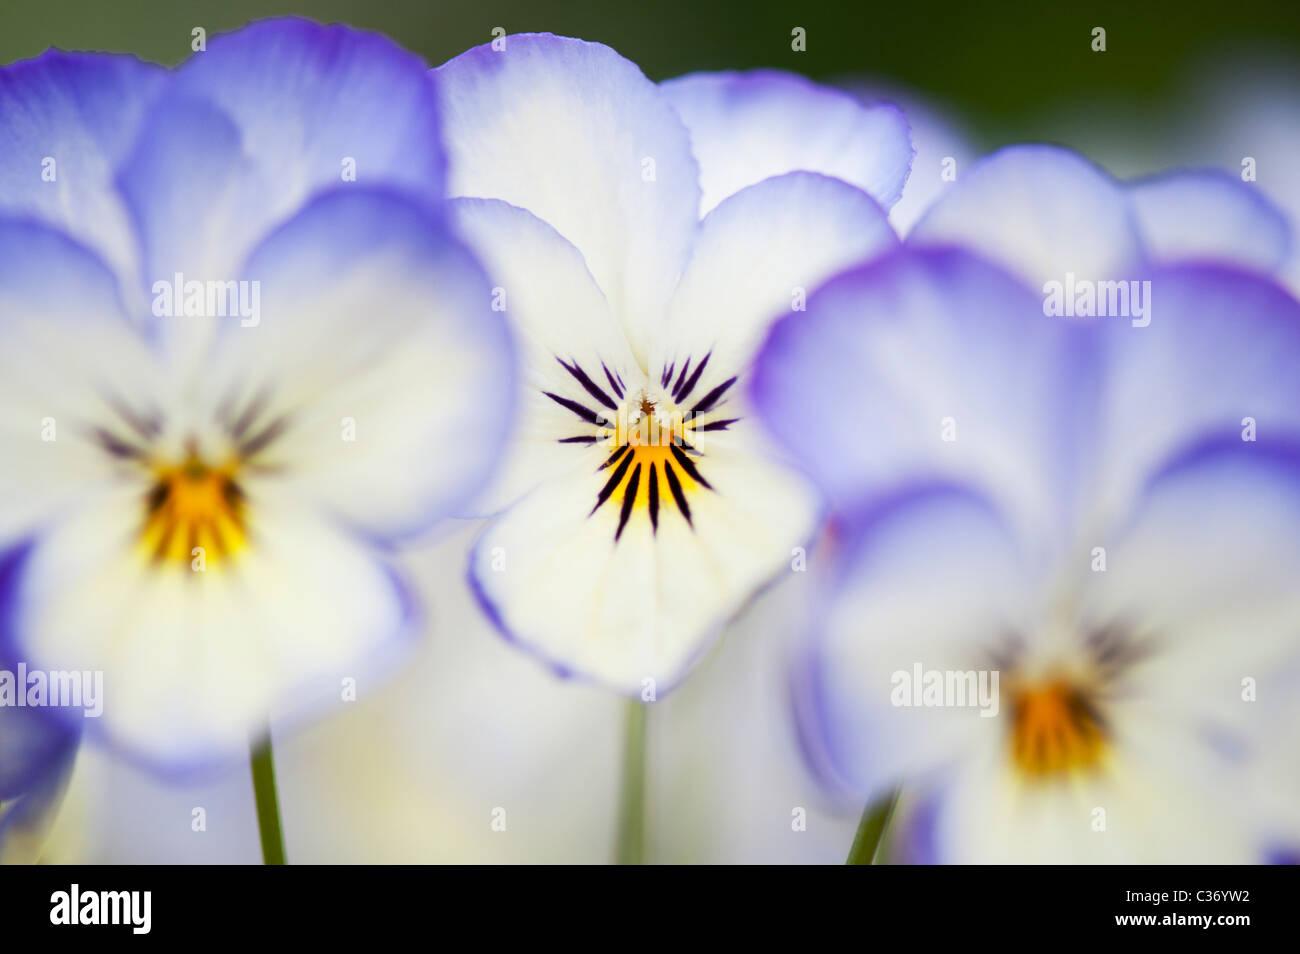 Viola Sorbet 'Kokosnuss Wirbel' Blumen Stockfoto